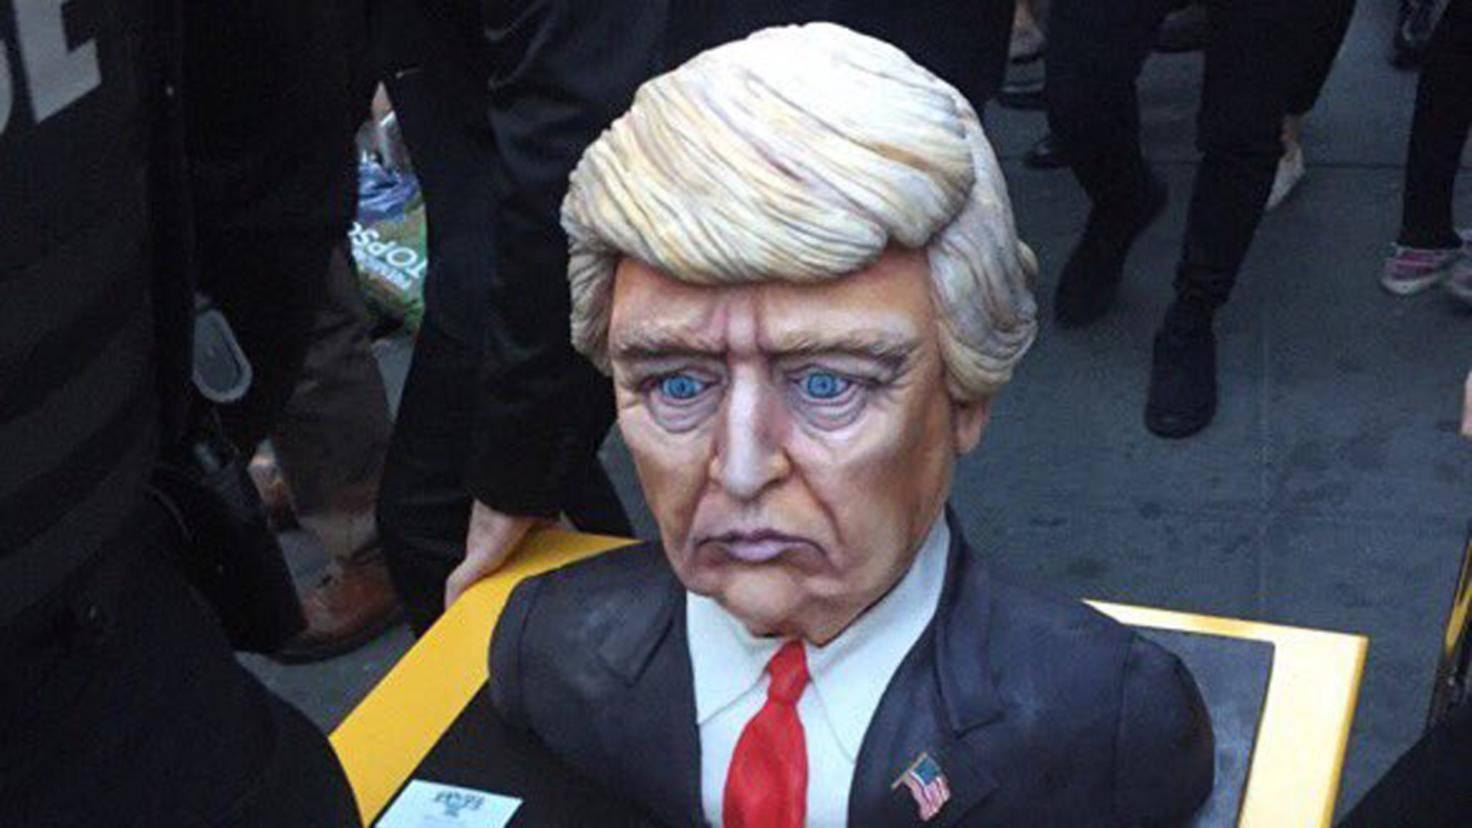 Donald Trump Kuchen